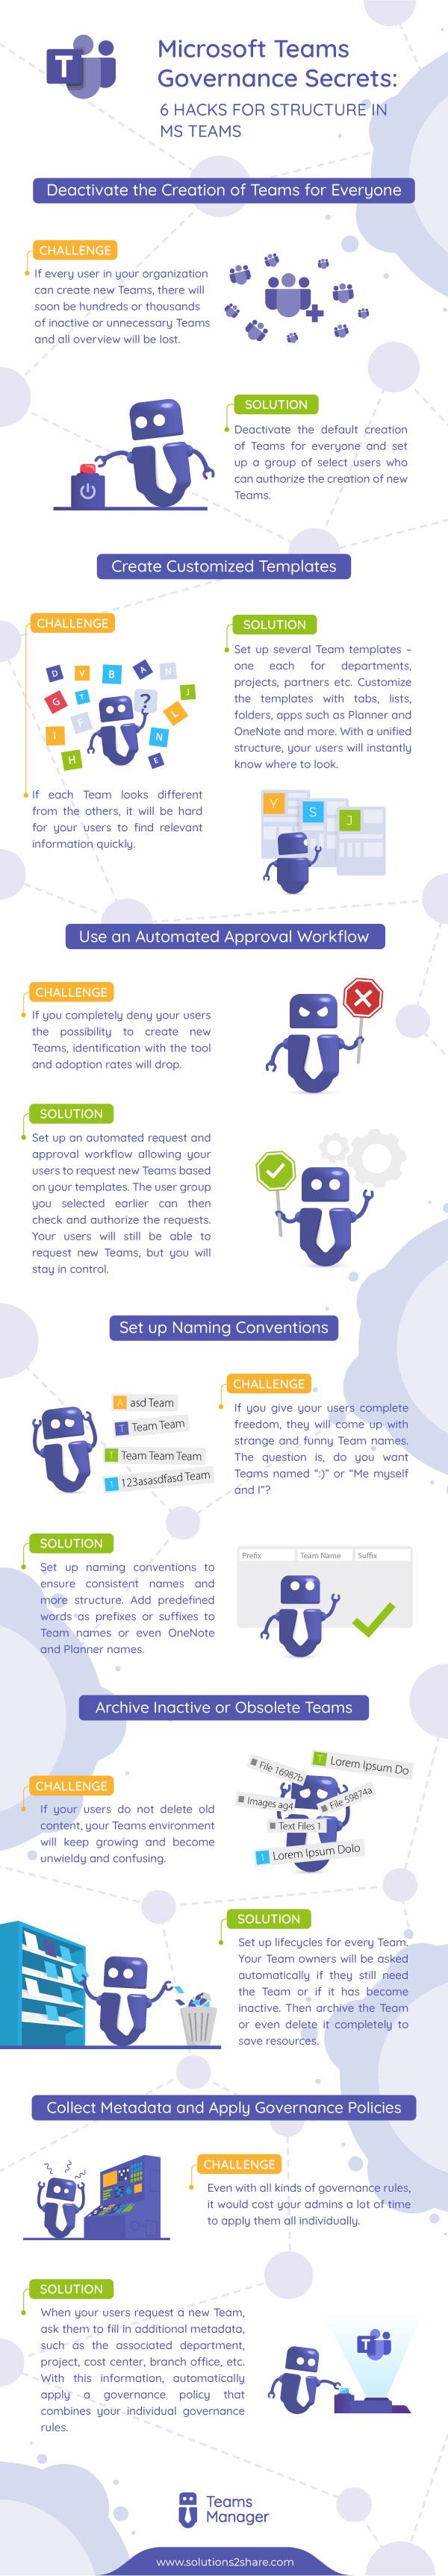 Microsoft Teams Governance Secrets Infographic